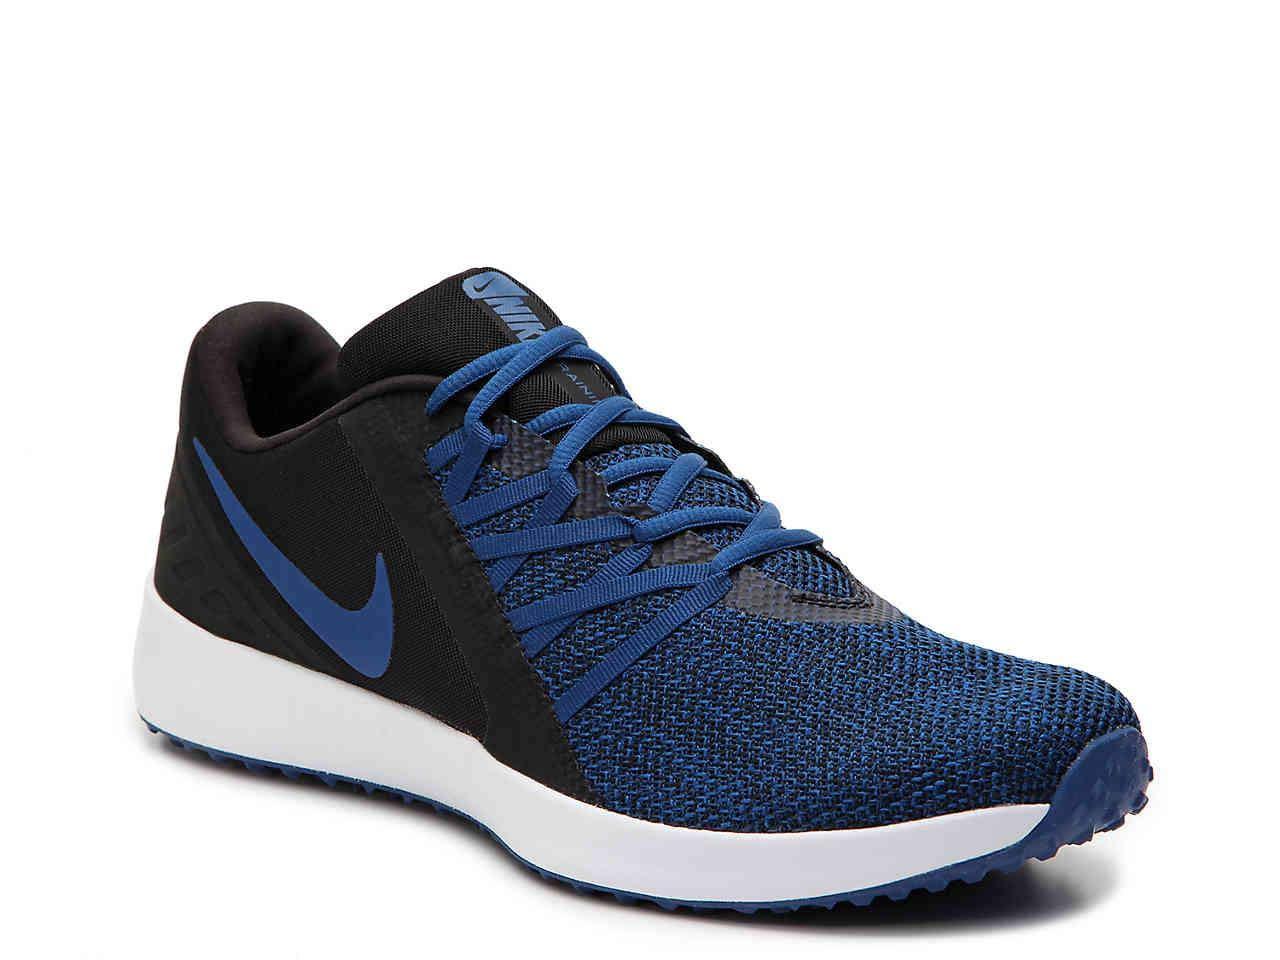 Nike Men's Varsity Compete Trainer (Black/Gym Blue, Size 10 M US)